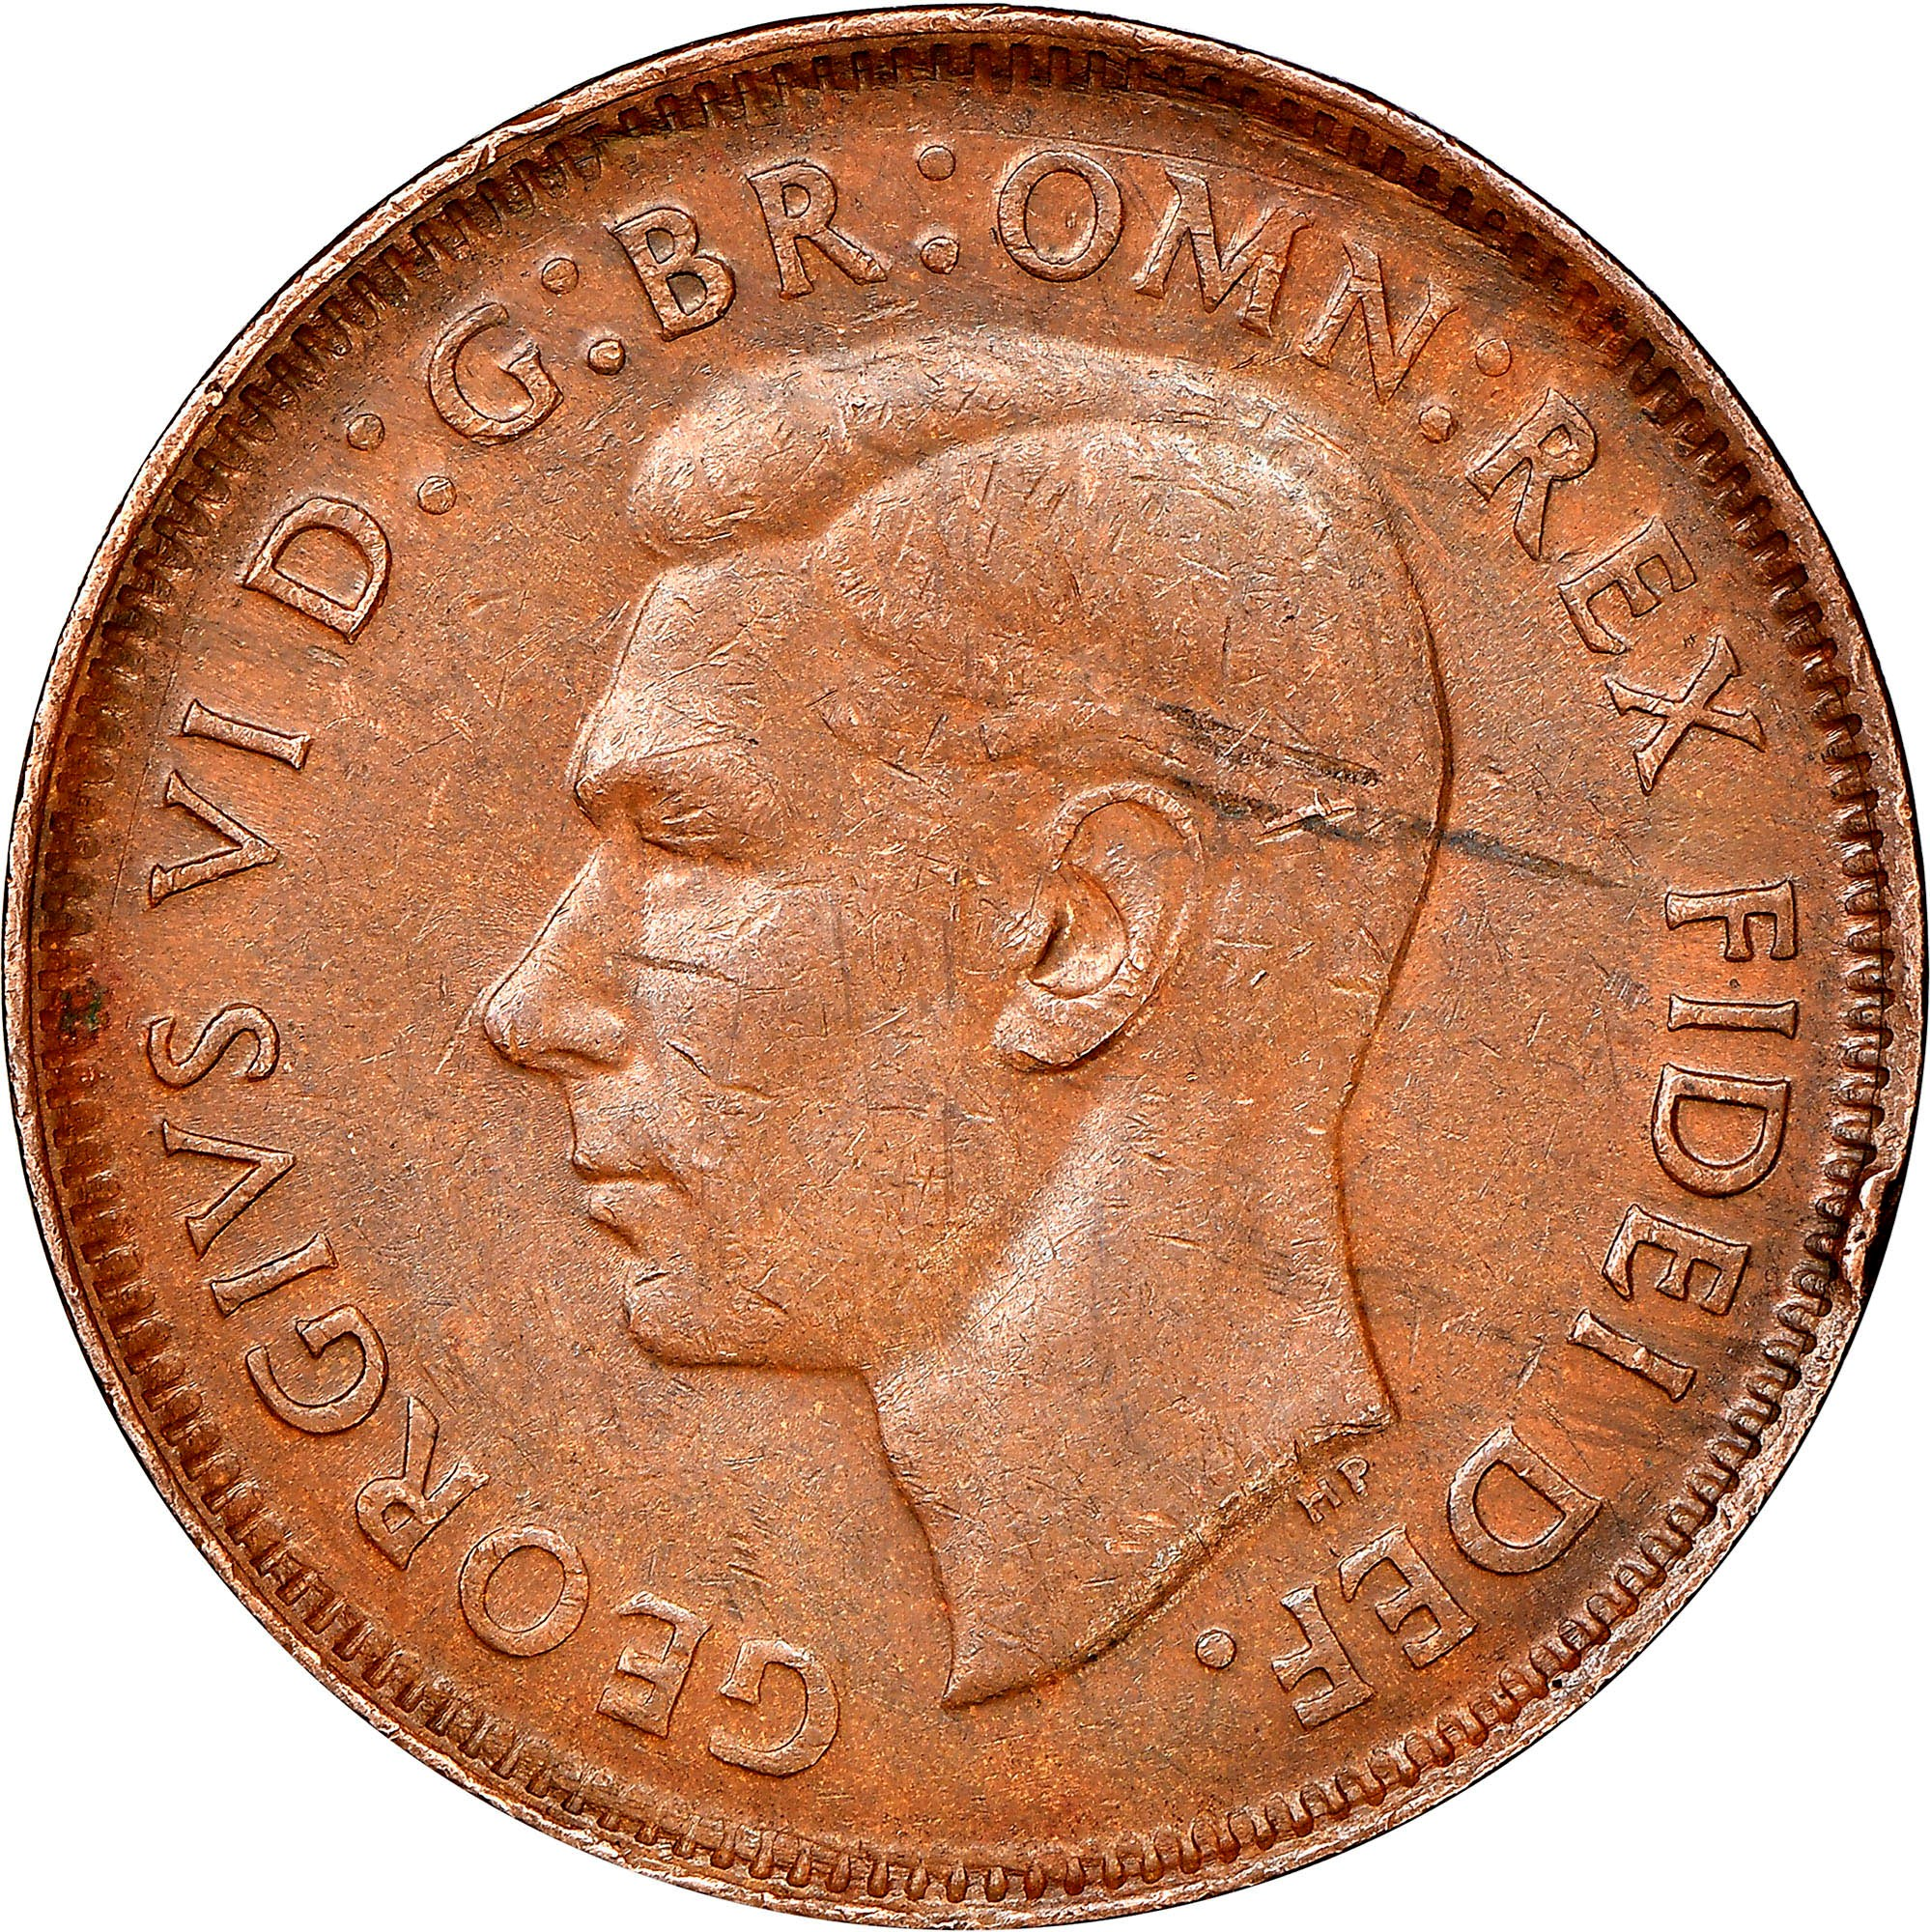 Australia 1/2 Penny obverse